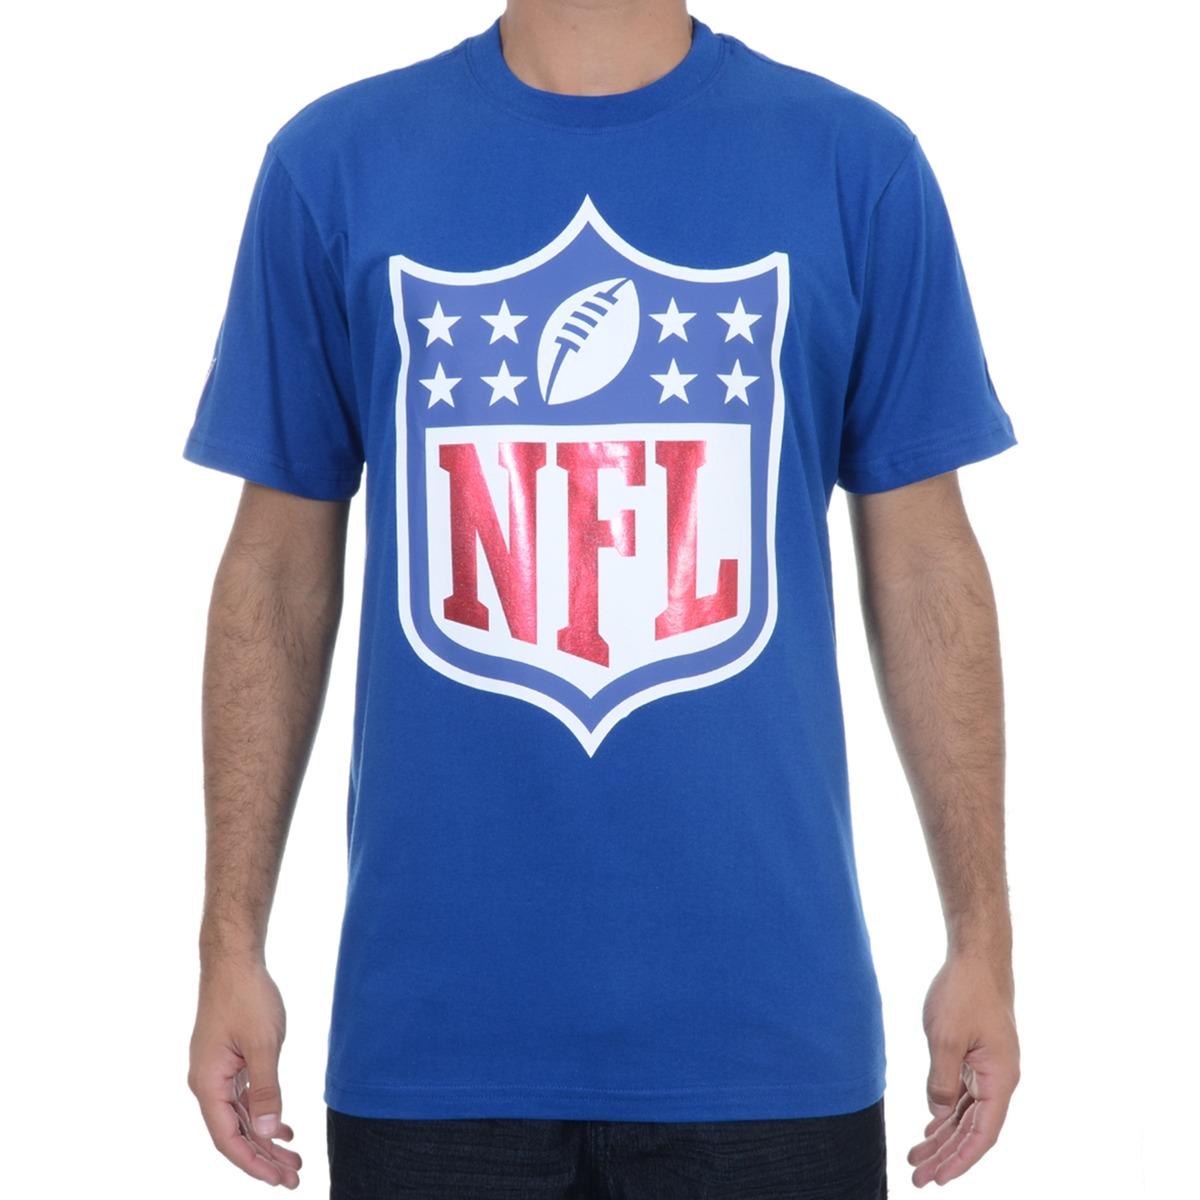 camiseta masculina new era draft nfl azul. Carregando zoom. 7cf59407612c5